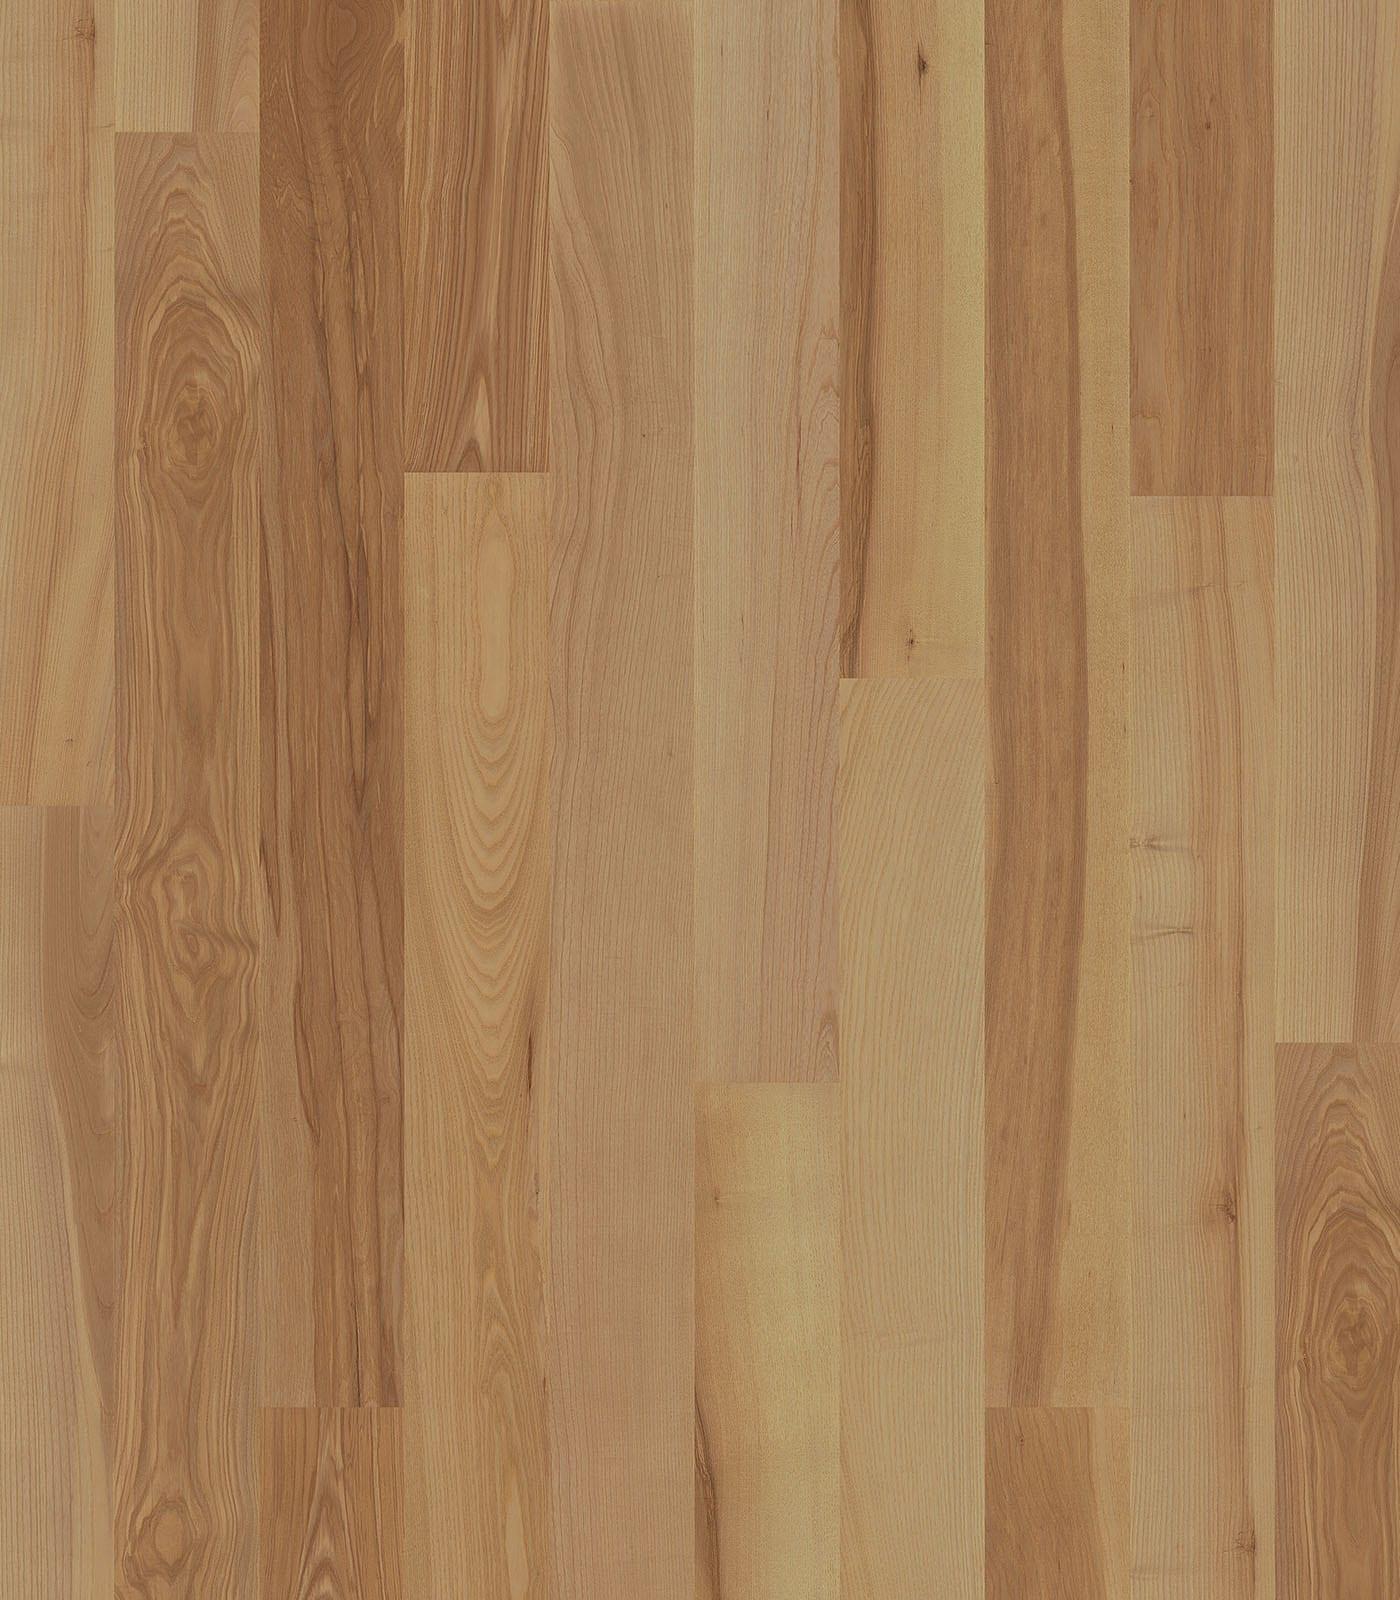 Vienna-After Oak Collection-European Ash Floors - Flat